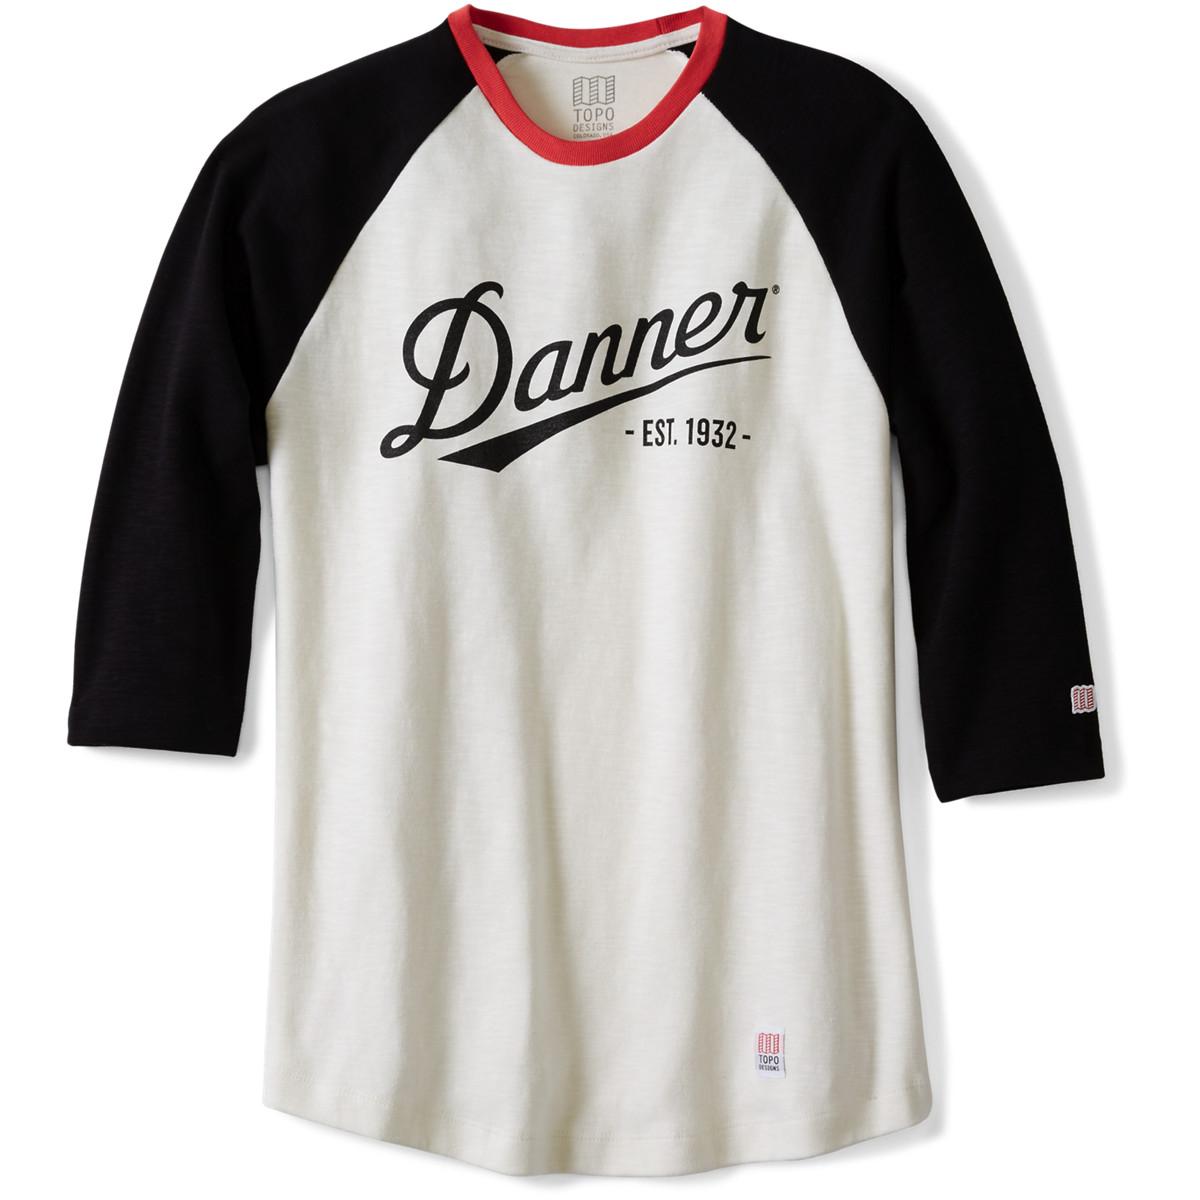 Topo x Danner Baseball Tee - Natural/Black